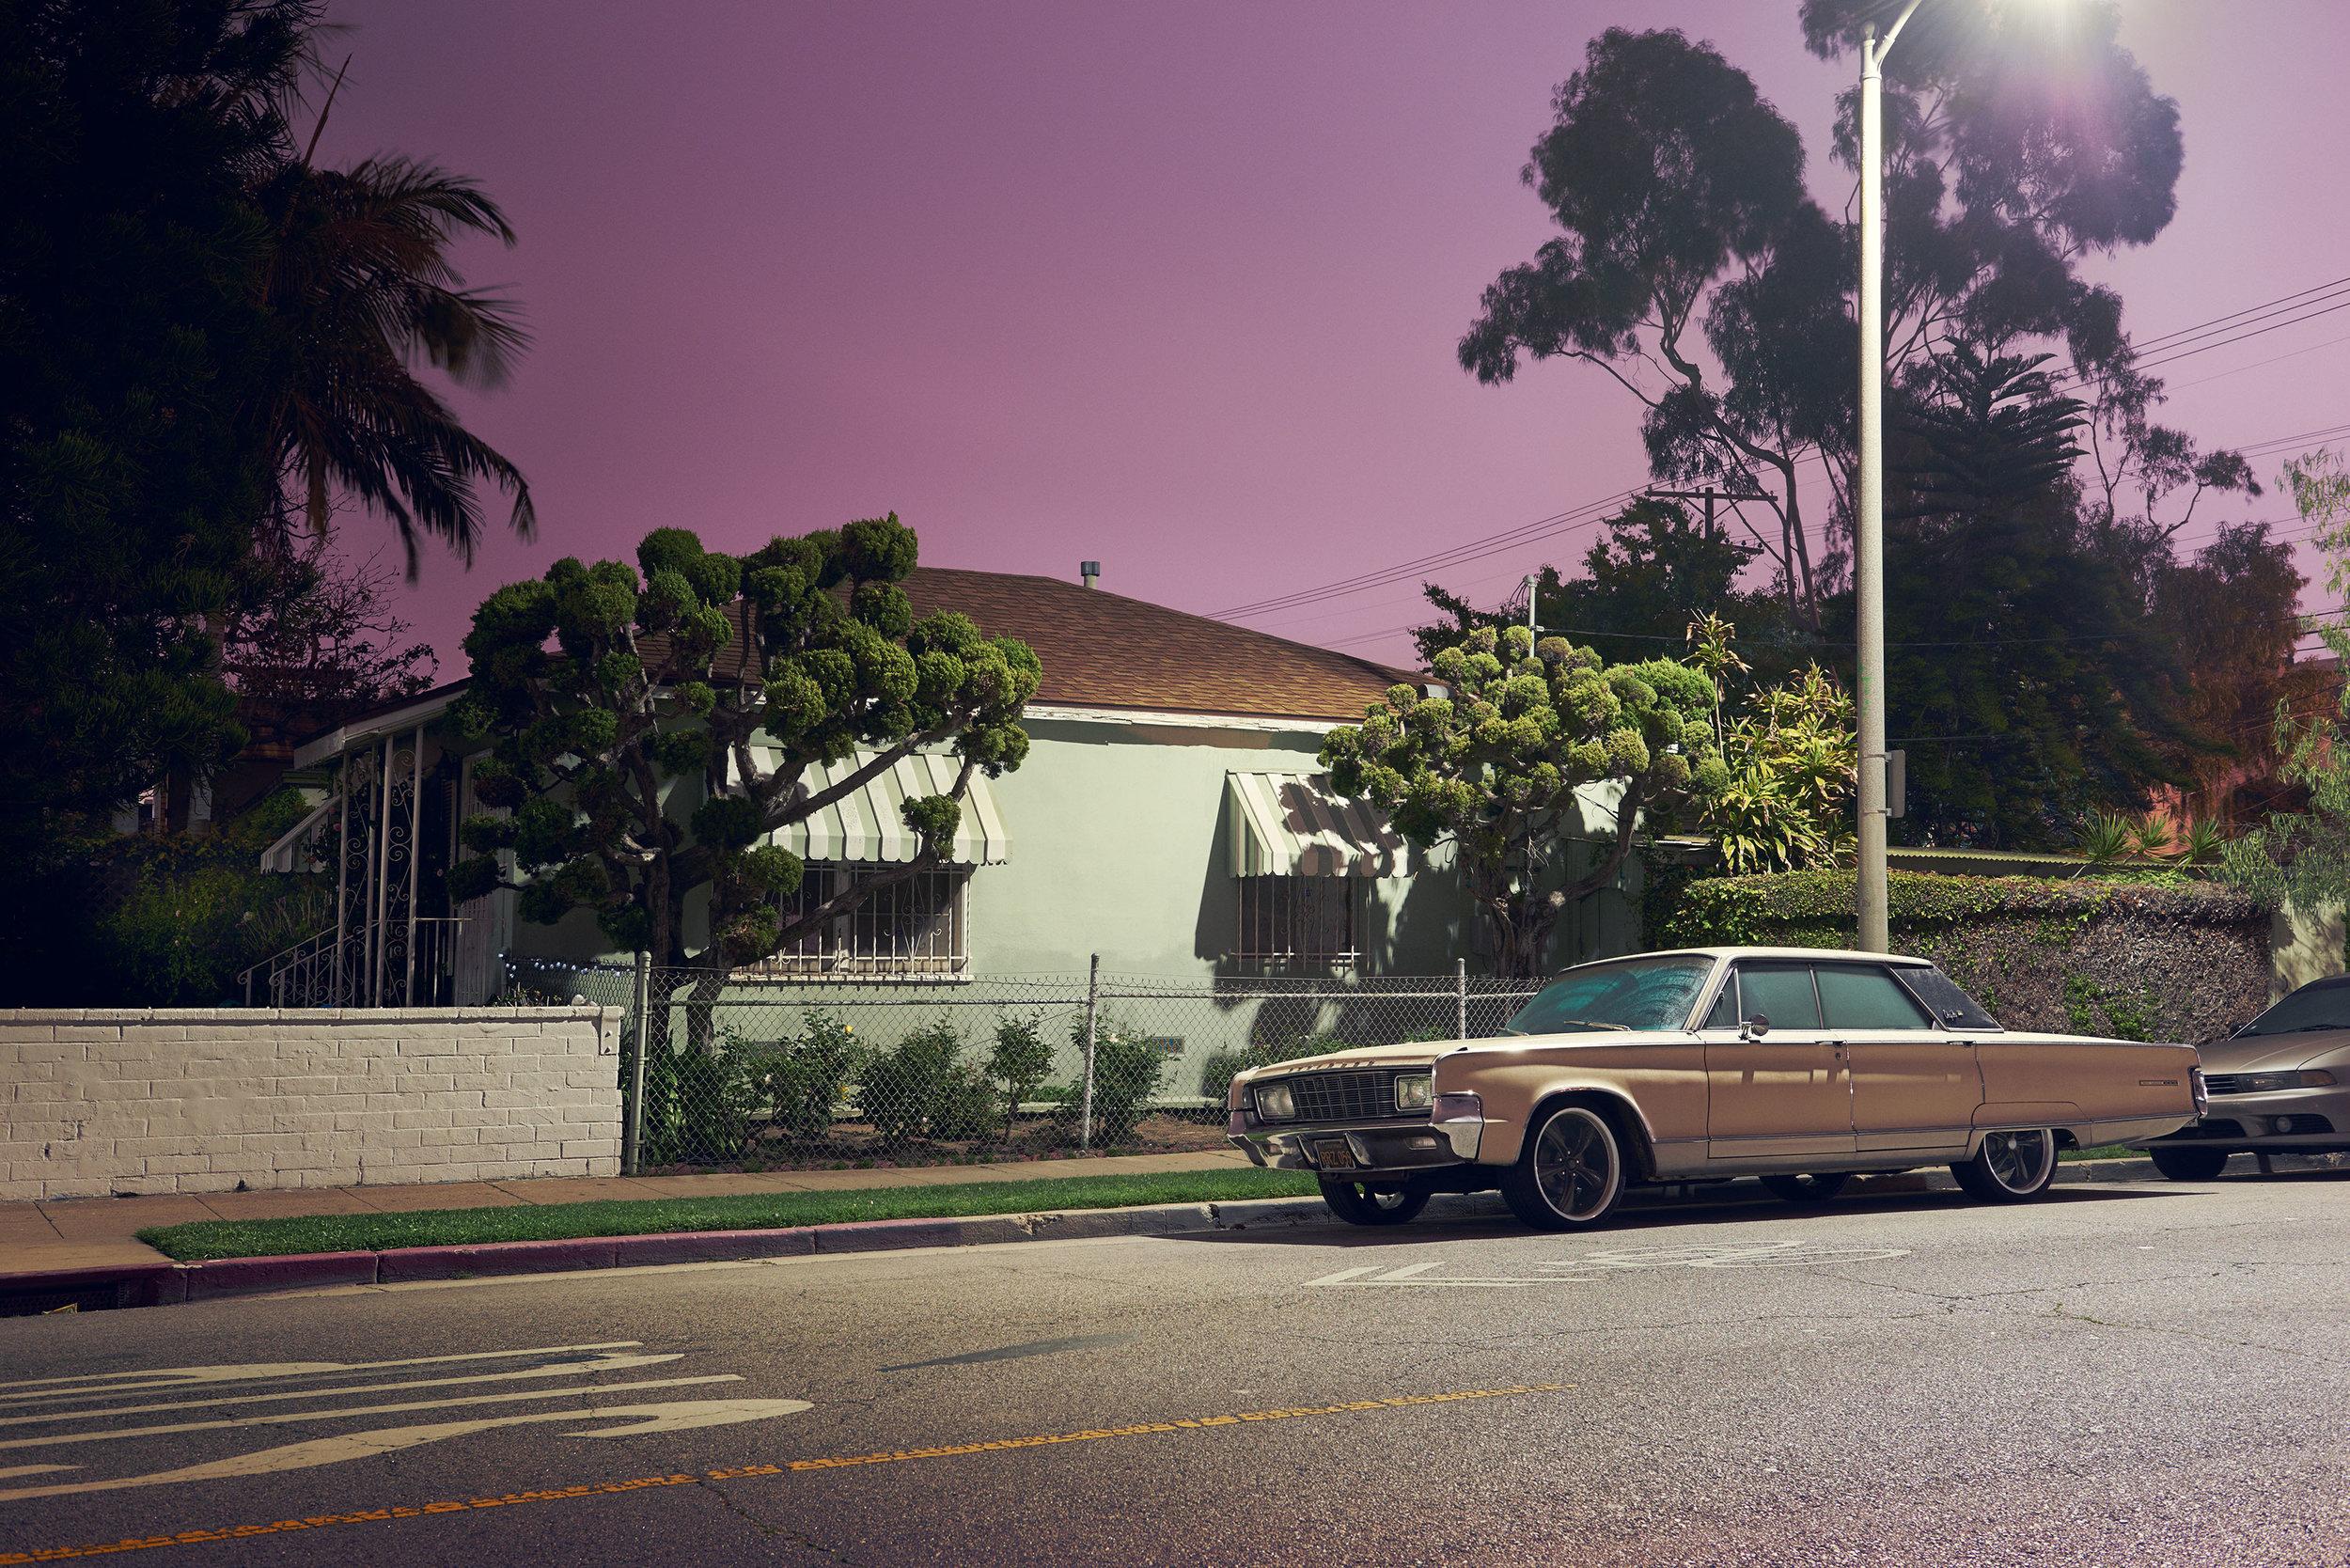 Night Cars Chrysler New Yorker UKB2017_03.jpg